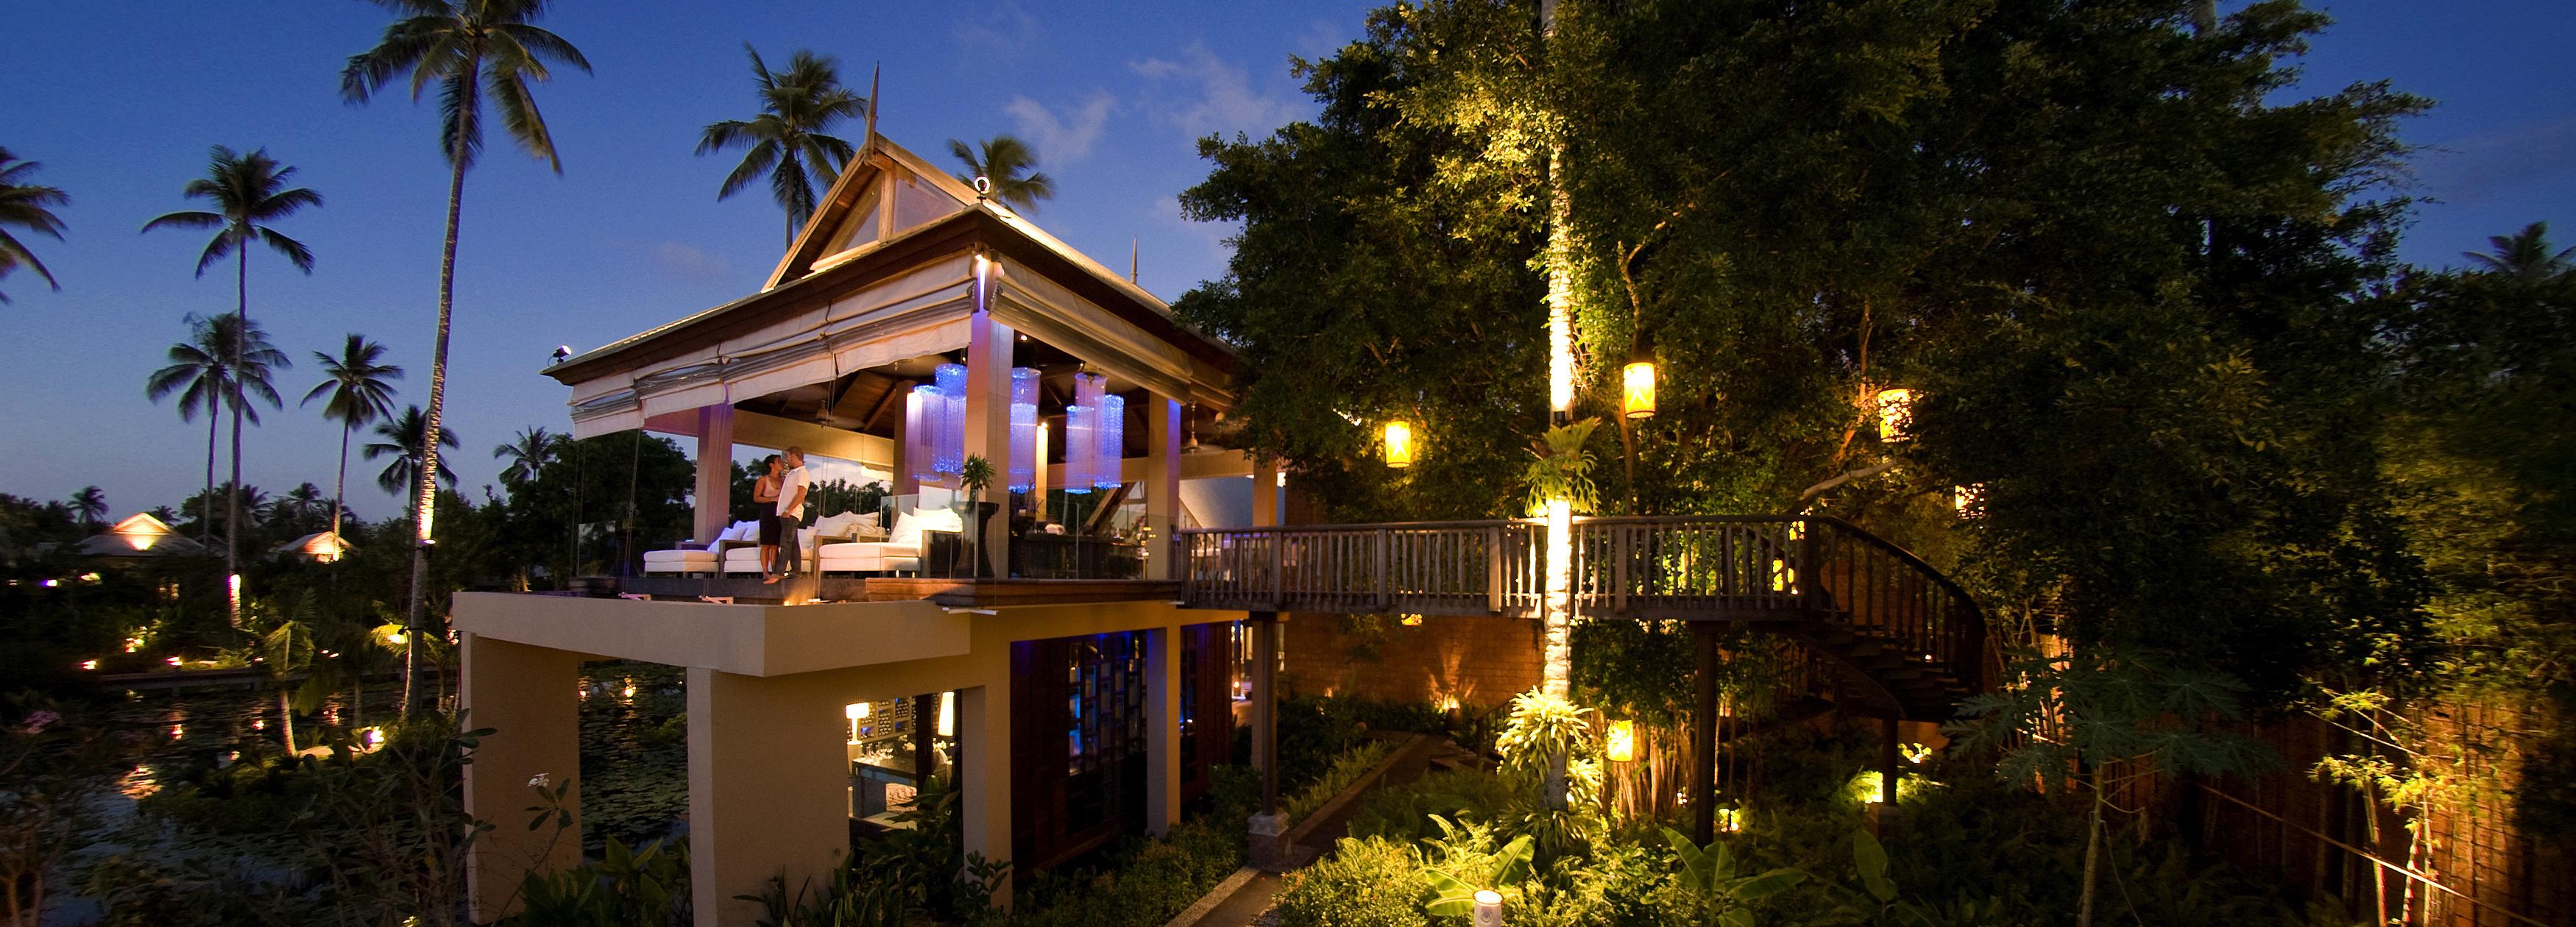 Tree_House_Restaurant_Phuket